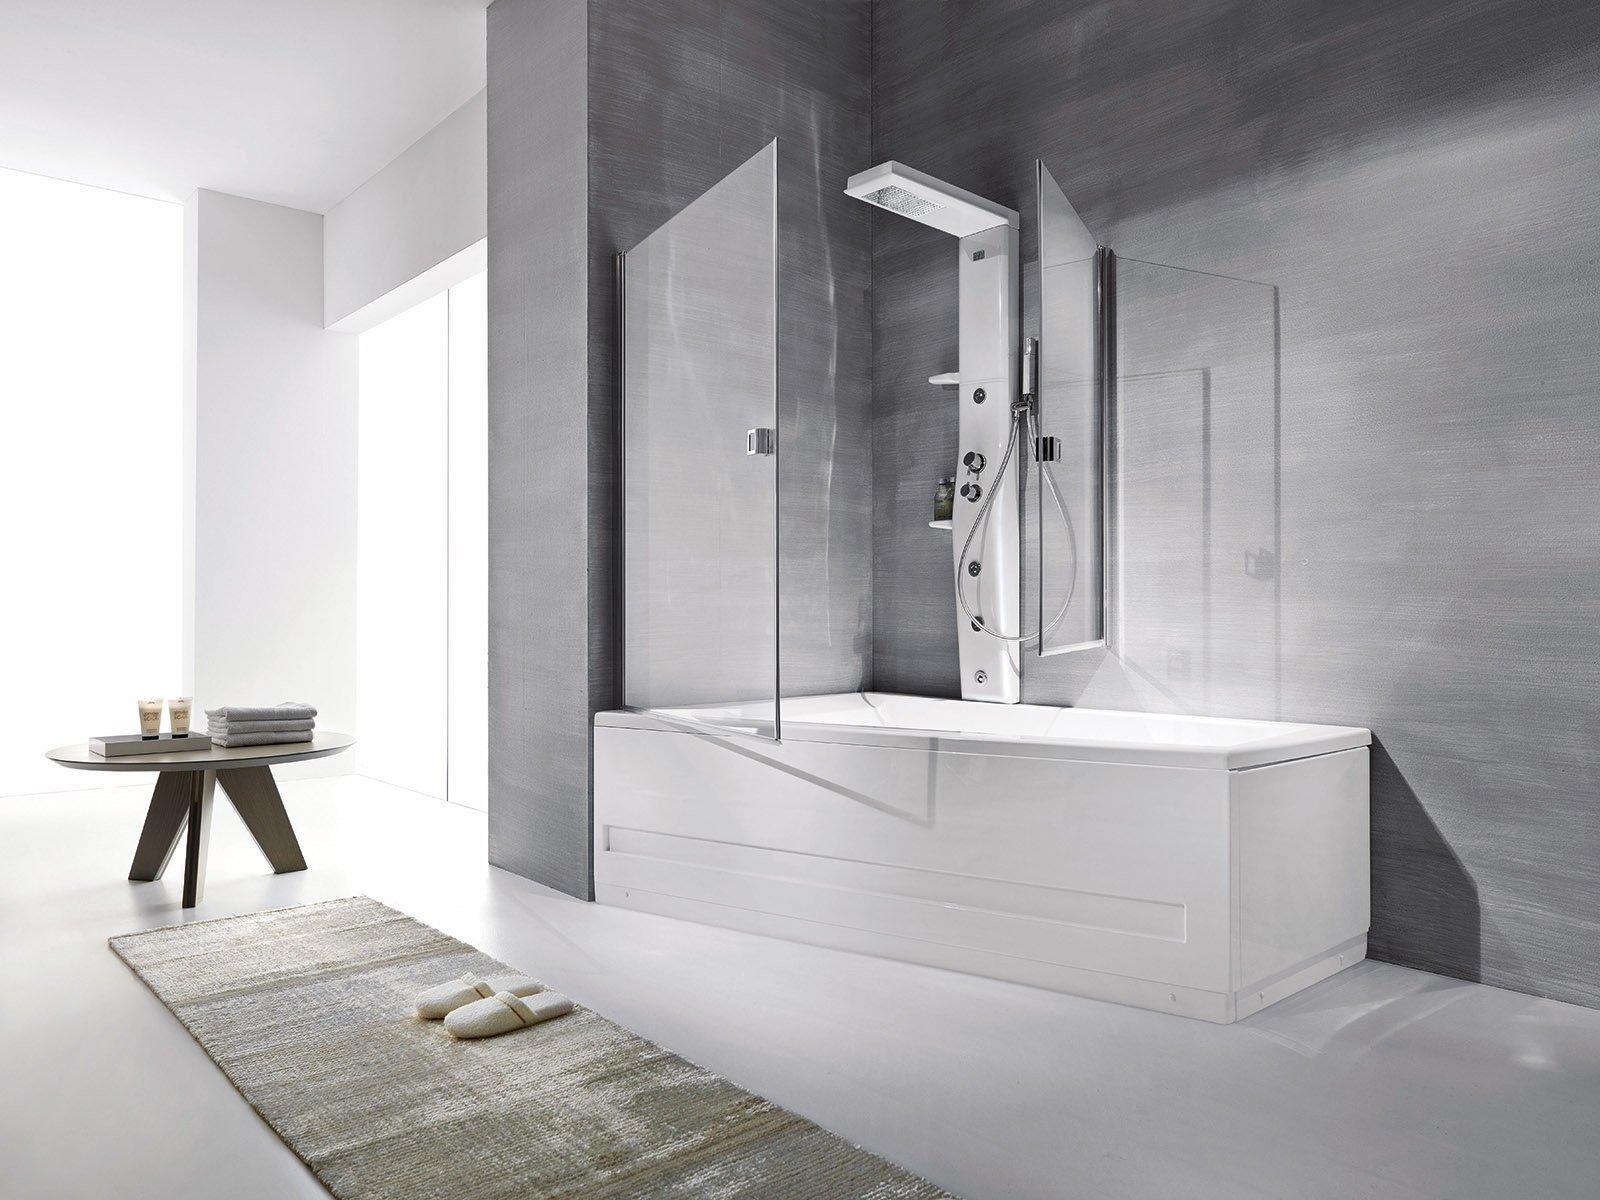 Vasche Da Bagno In Vetro Prezzi : Treesse vasche vasche da bagno edilceramiche di maccanò